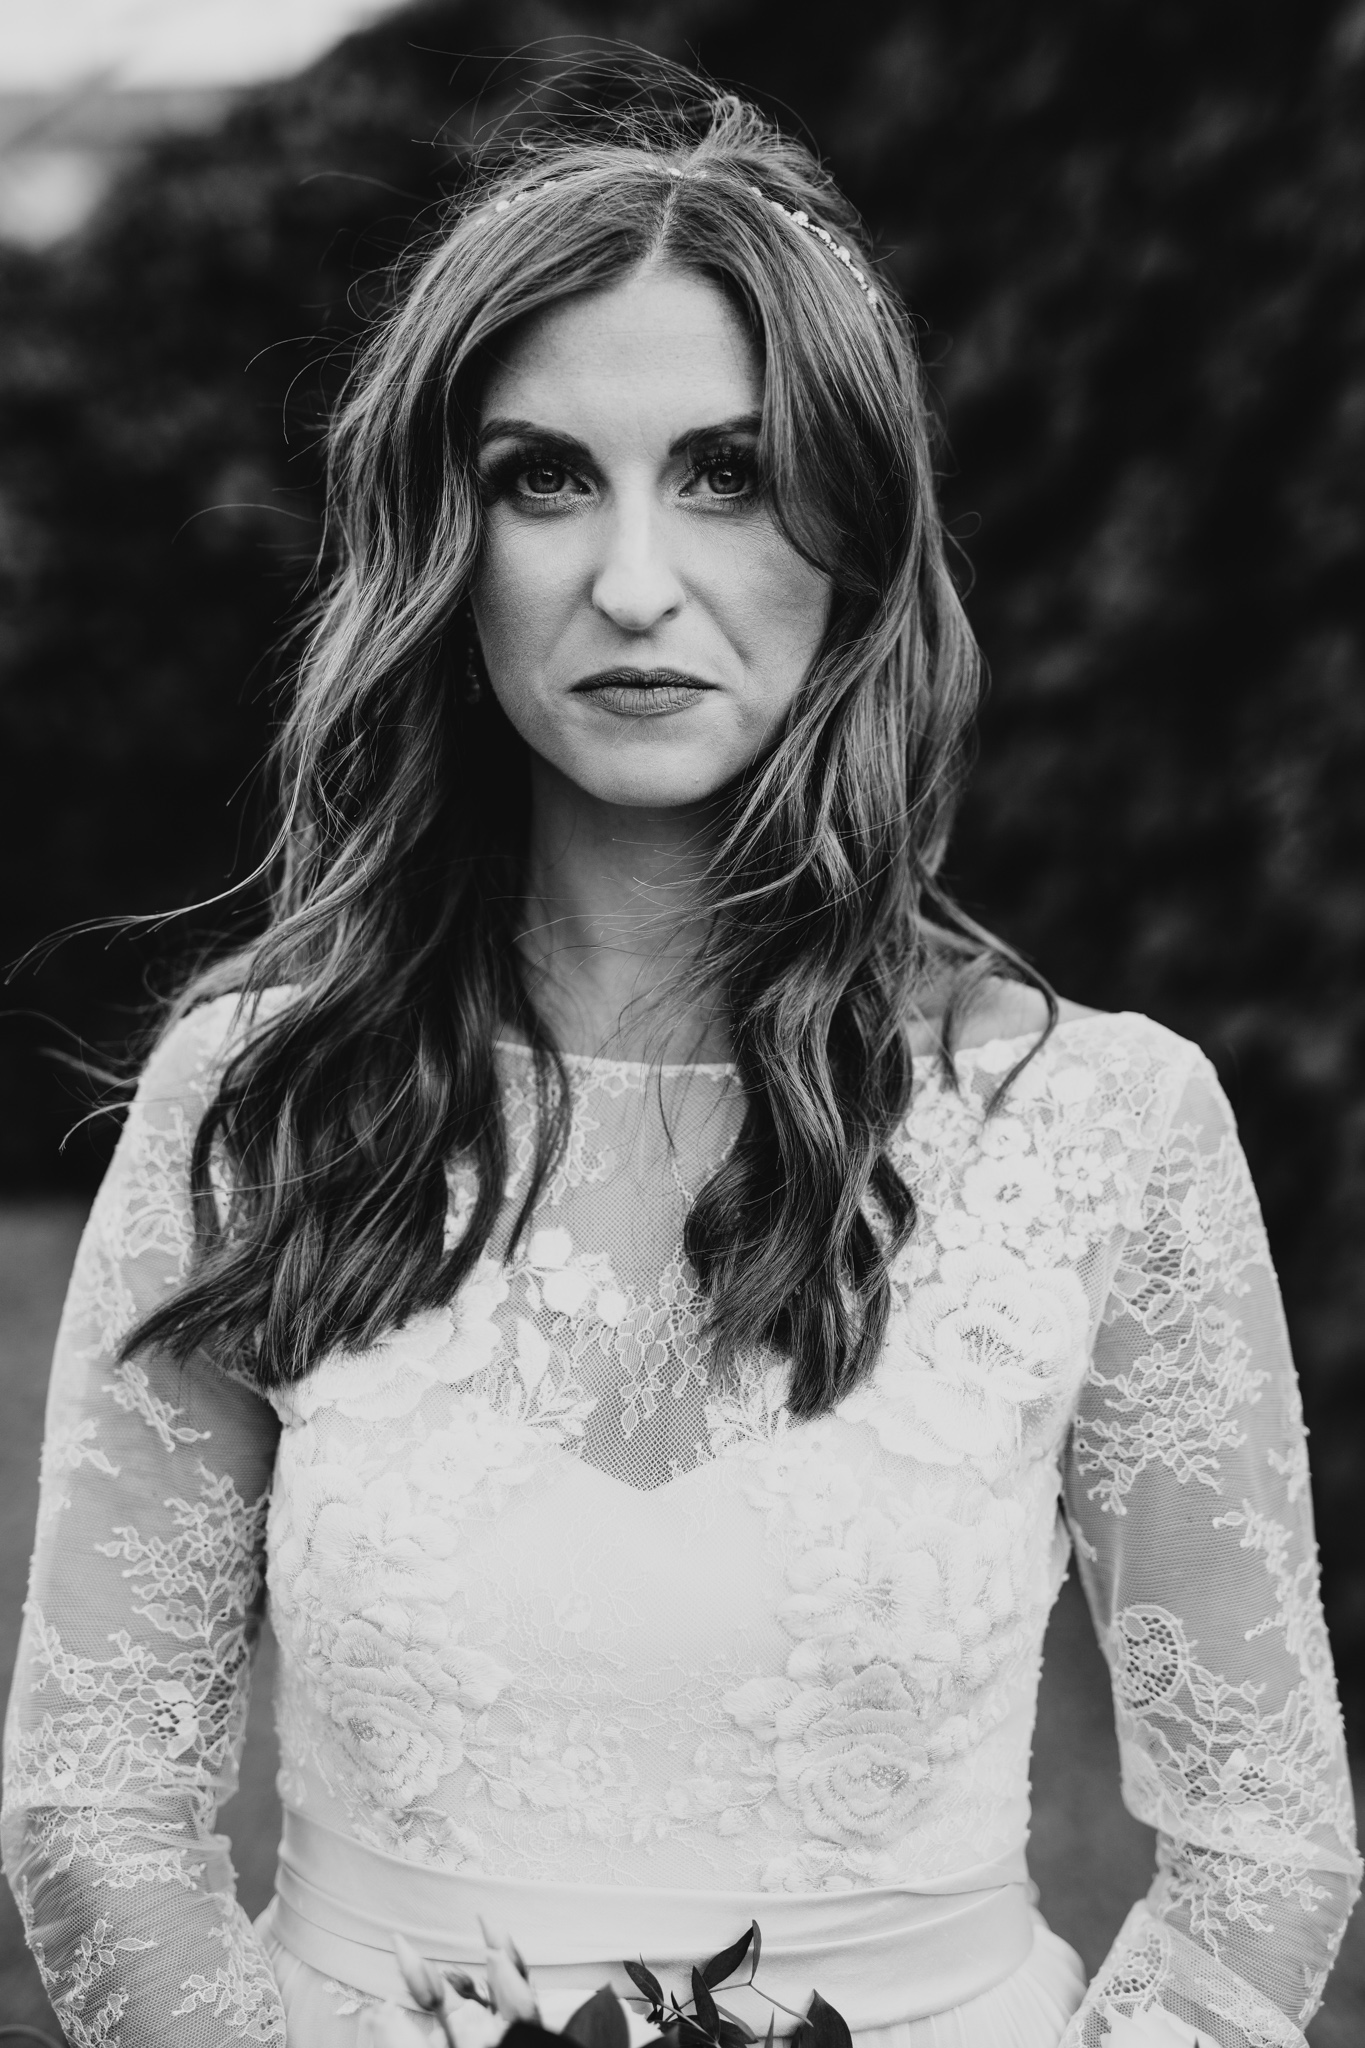 424-WEB-Jonathan-Kuhn-Photography-Lauren-Evan-Wedding-9871.jpg